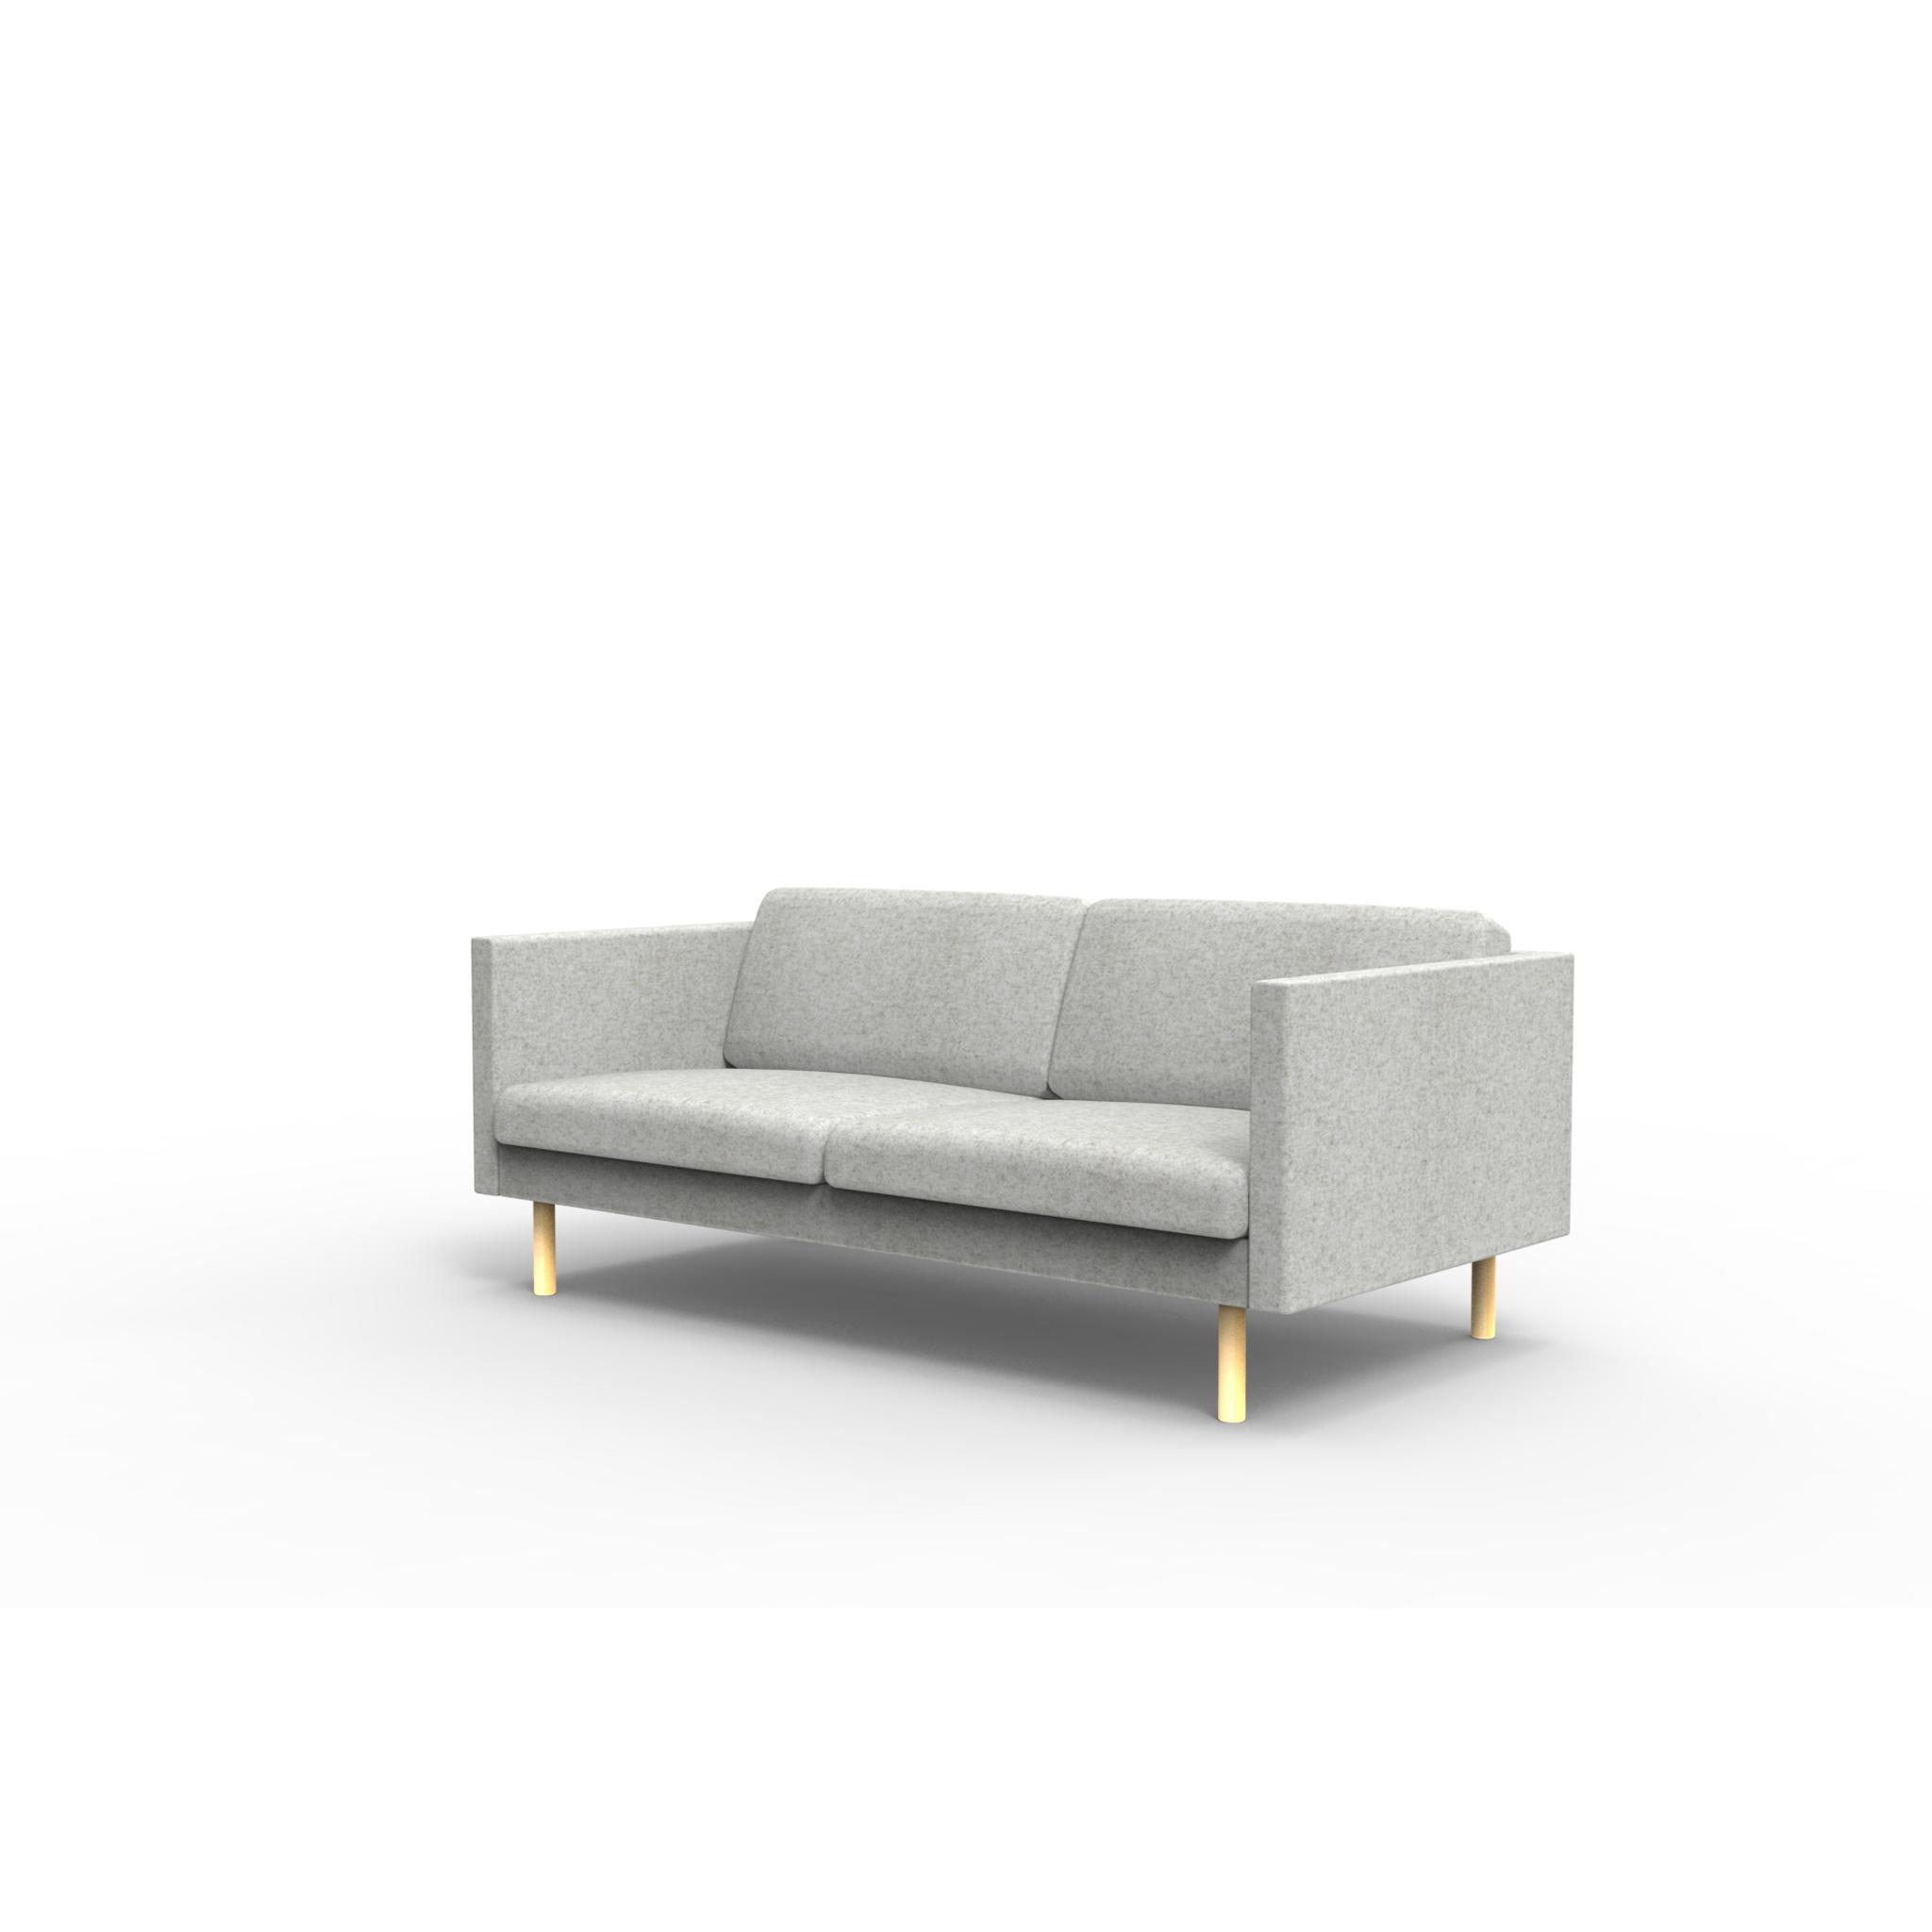 2er sofa leaf skandinavisch jetzt online kaufen. Black Bedroom Furniture Sets. Home Design Ideas